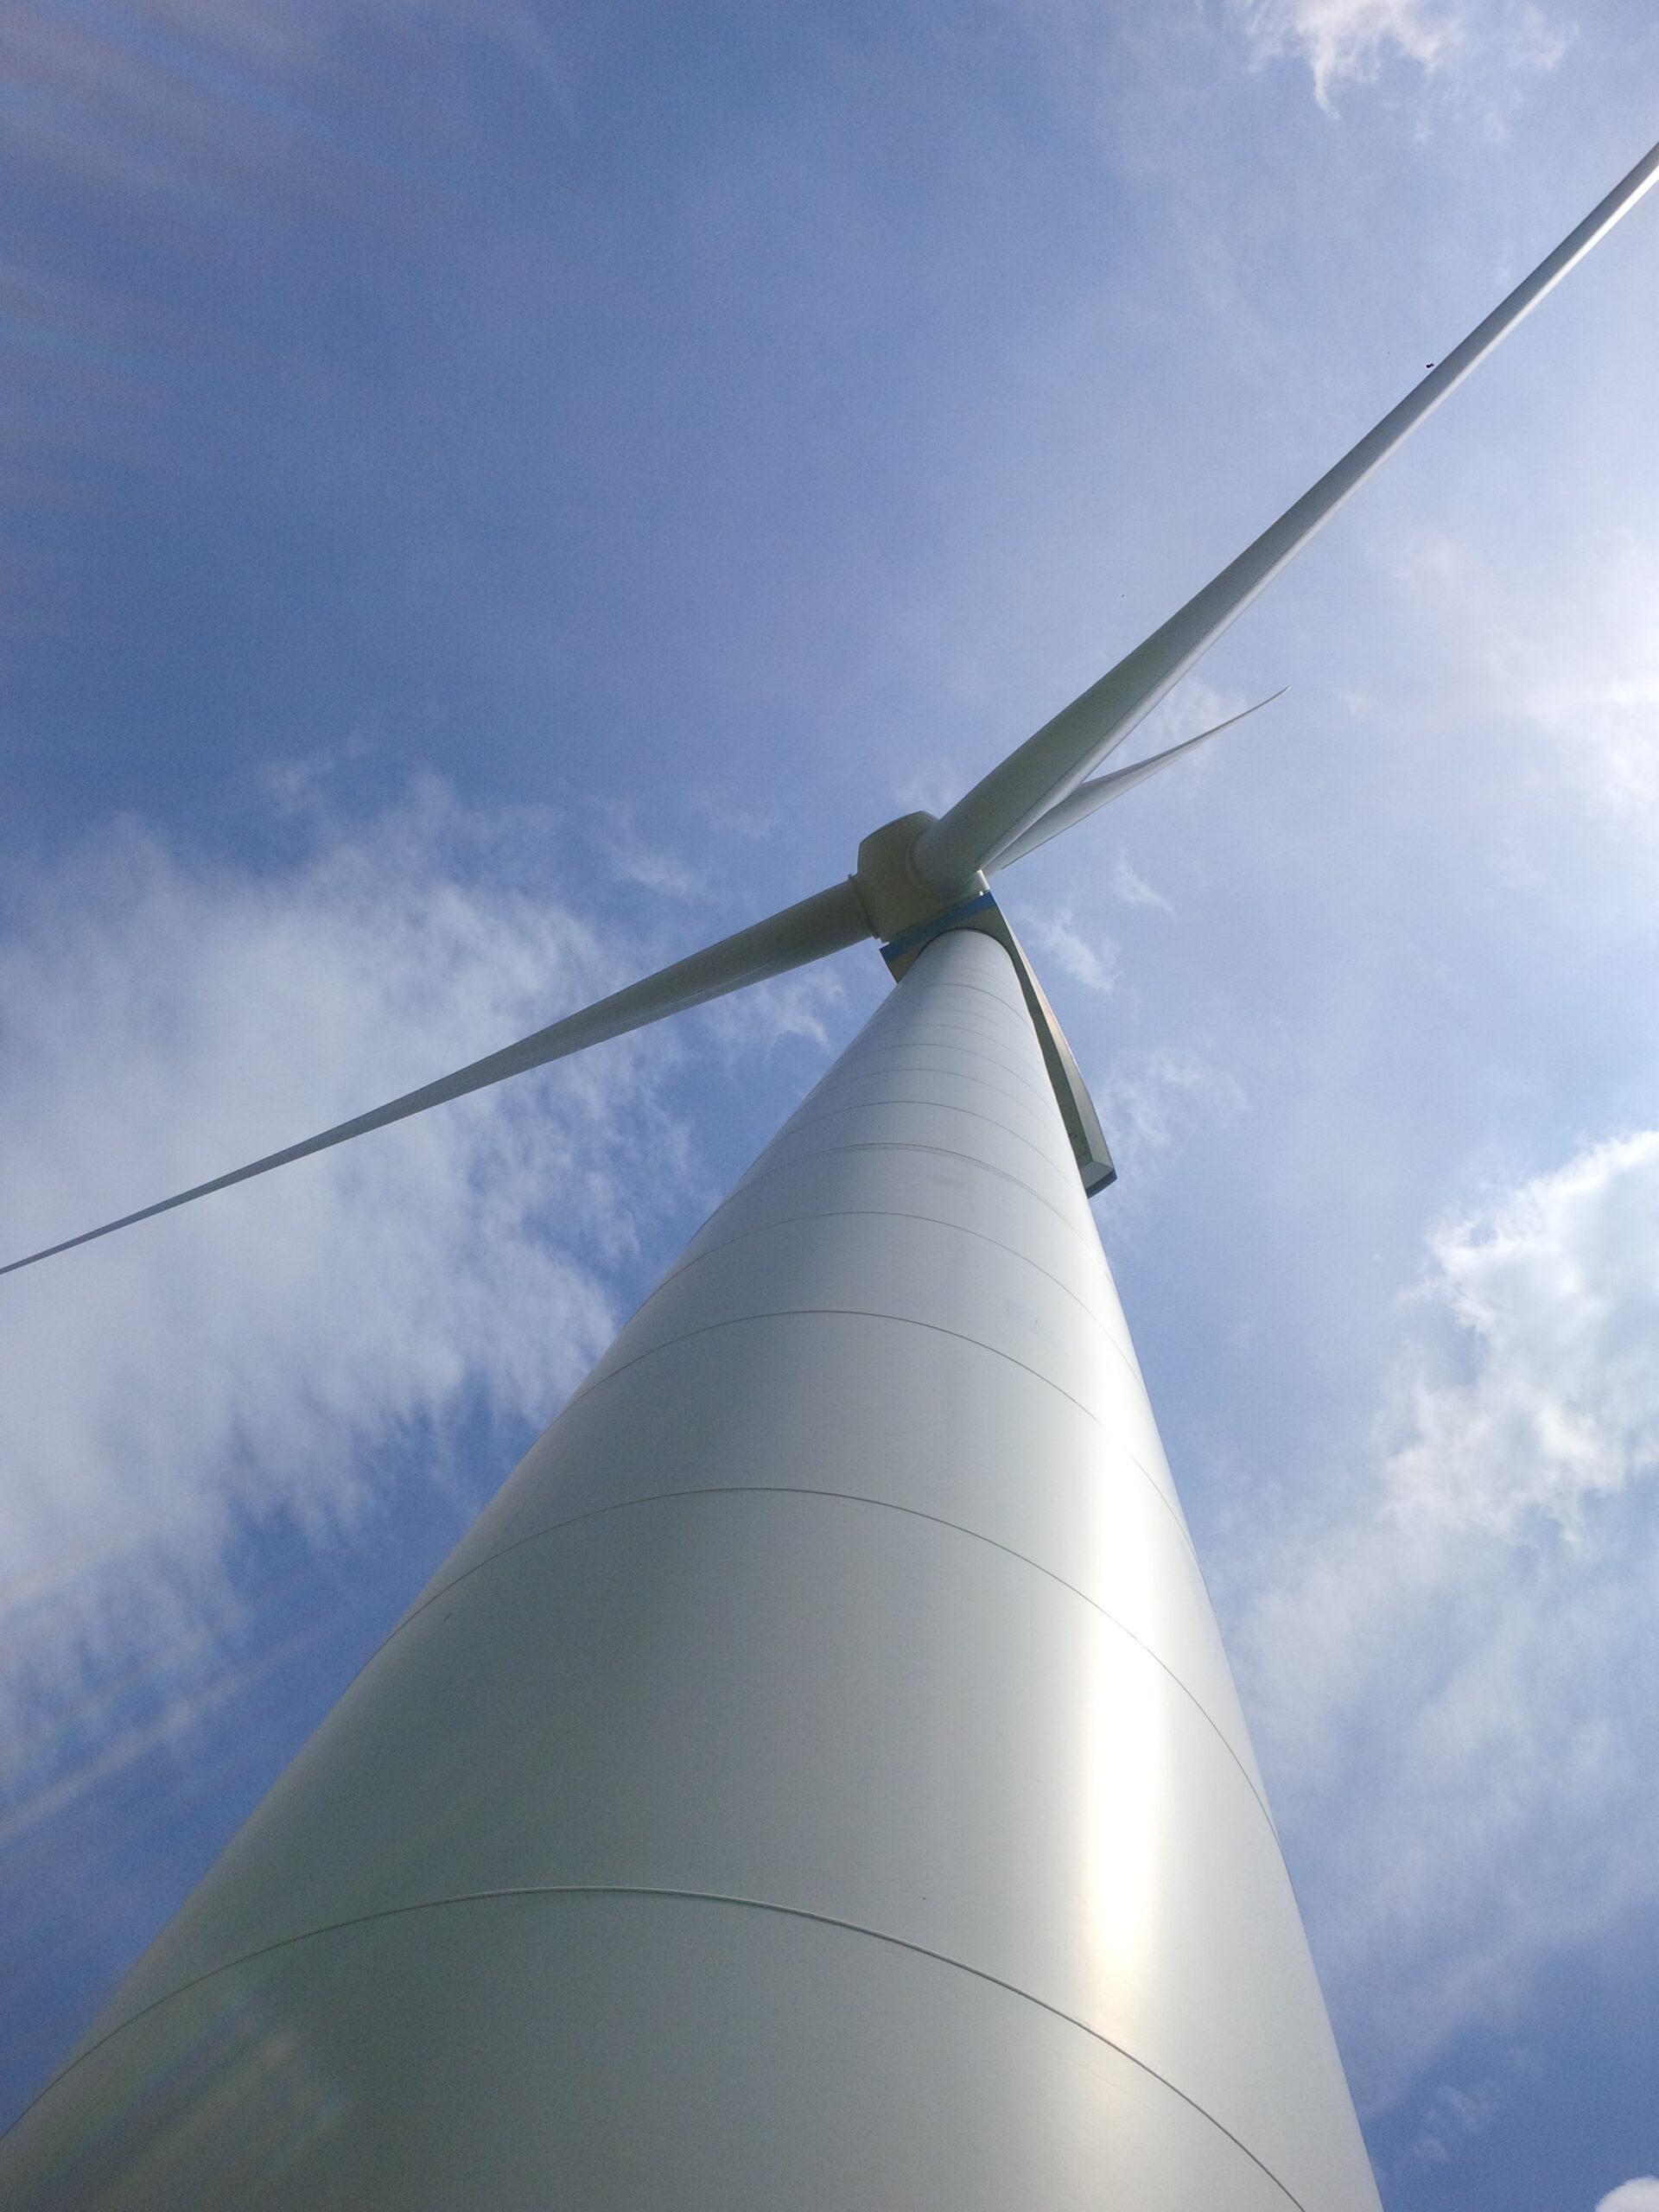 Windgenerator in Brandenburg Foto © Gerhard Hofmann für Solarify